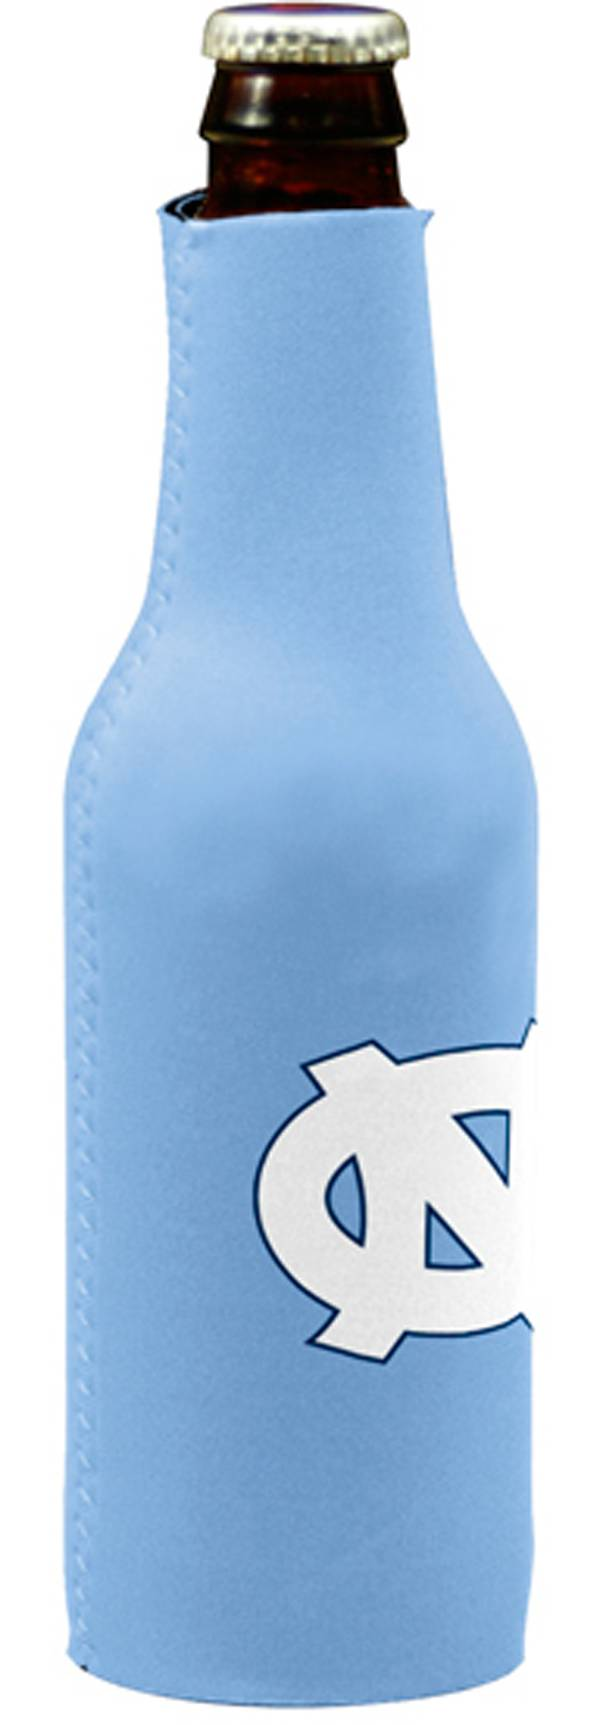 North Carolina Tar Heels Bottle Koozie product image